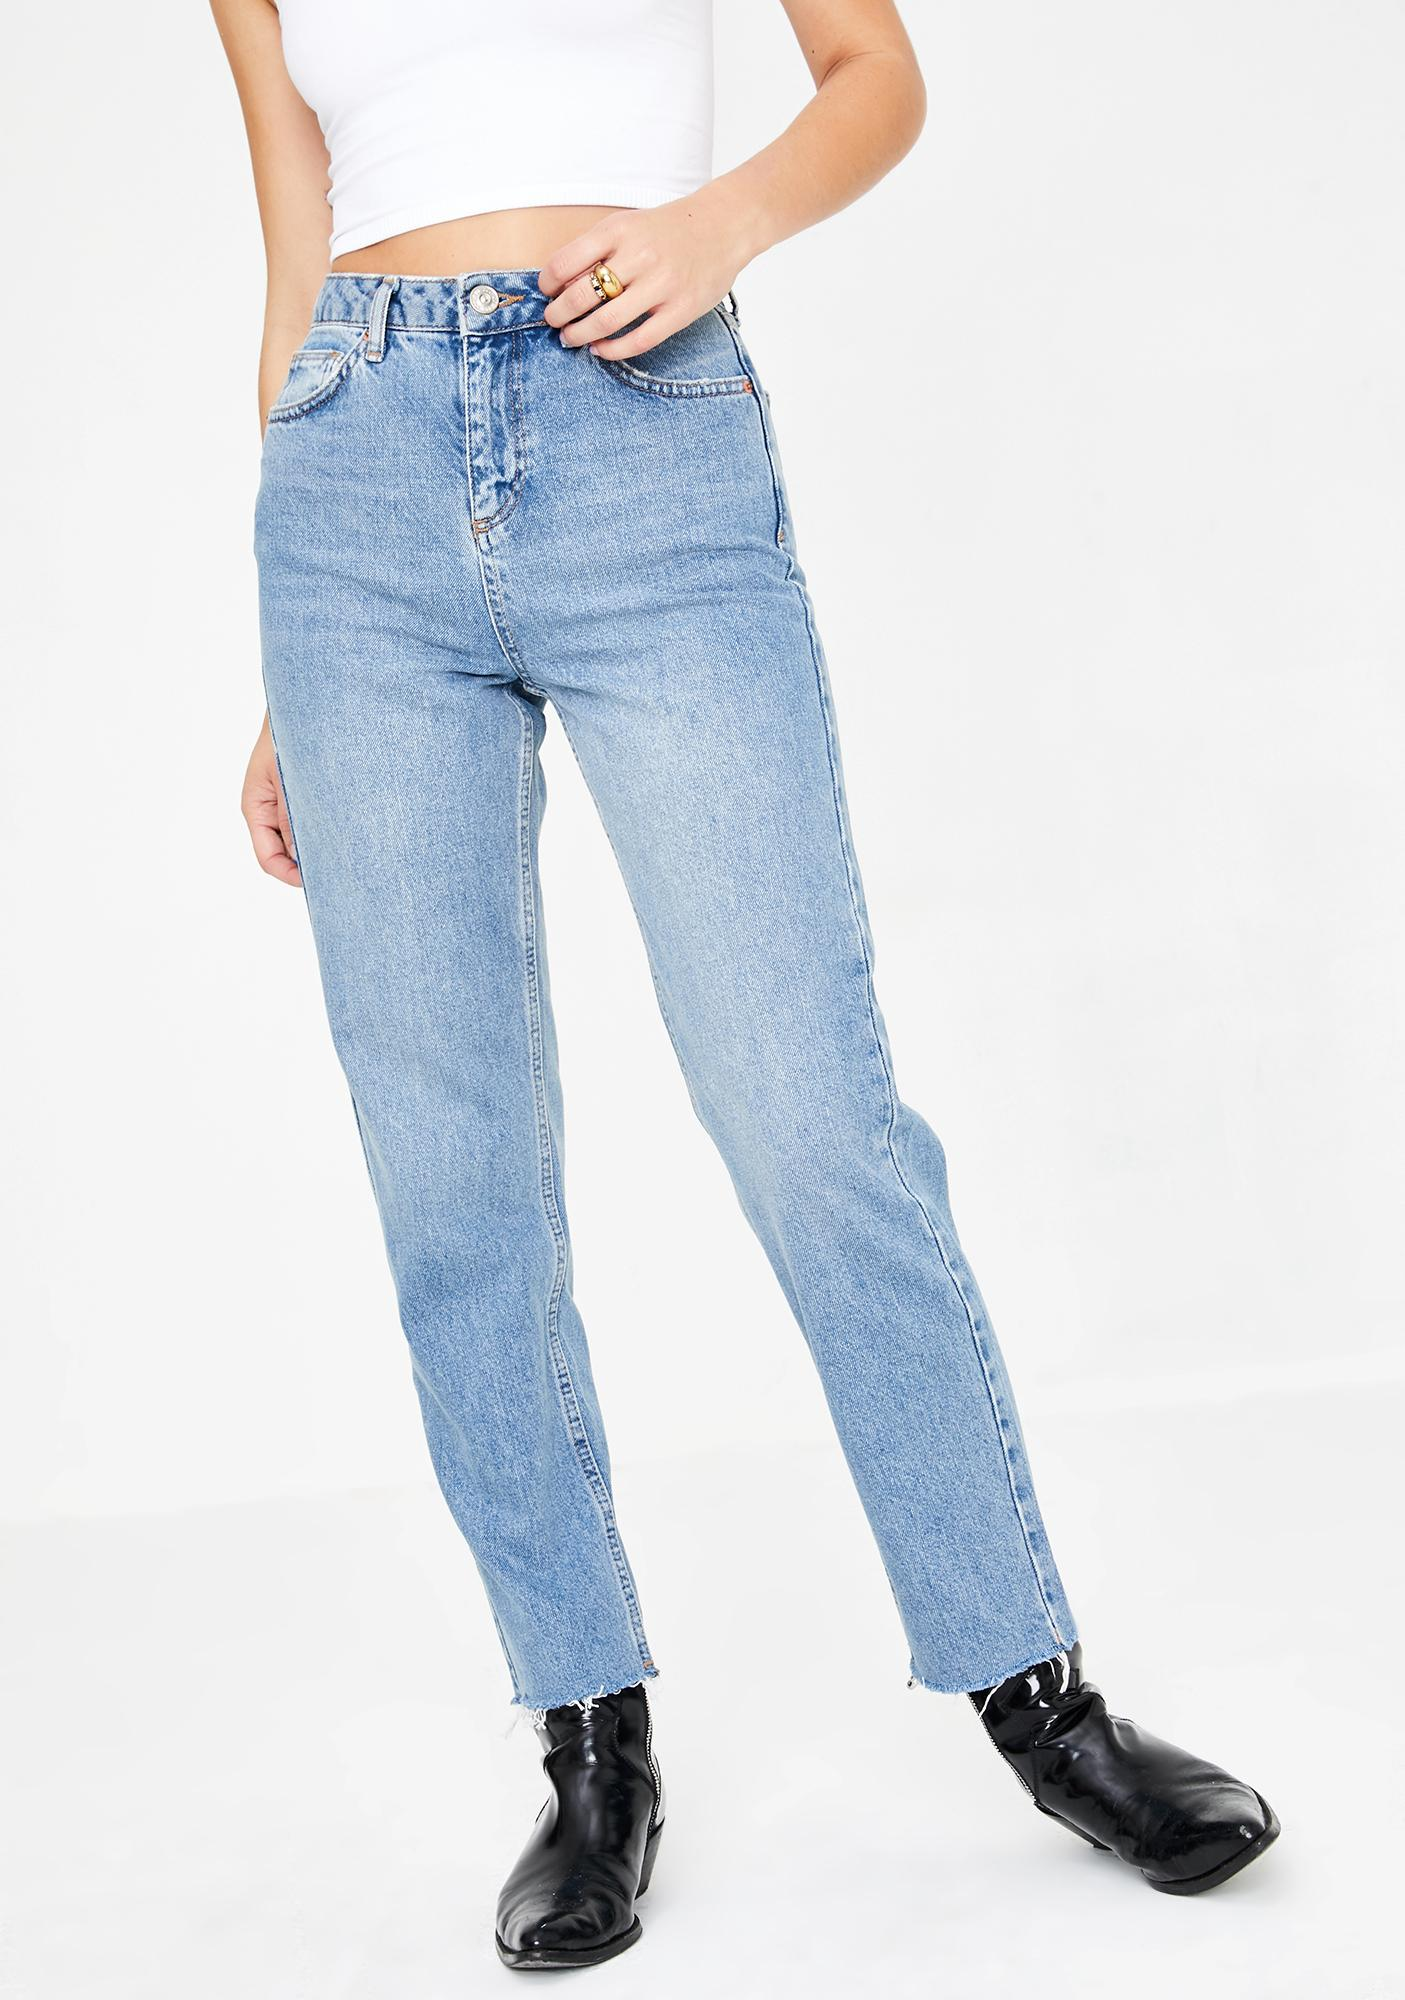 BDG Pax High Rise Vintage Wash Jeans